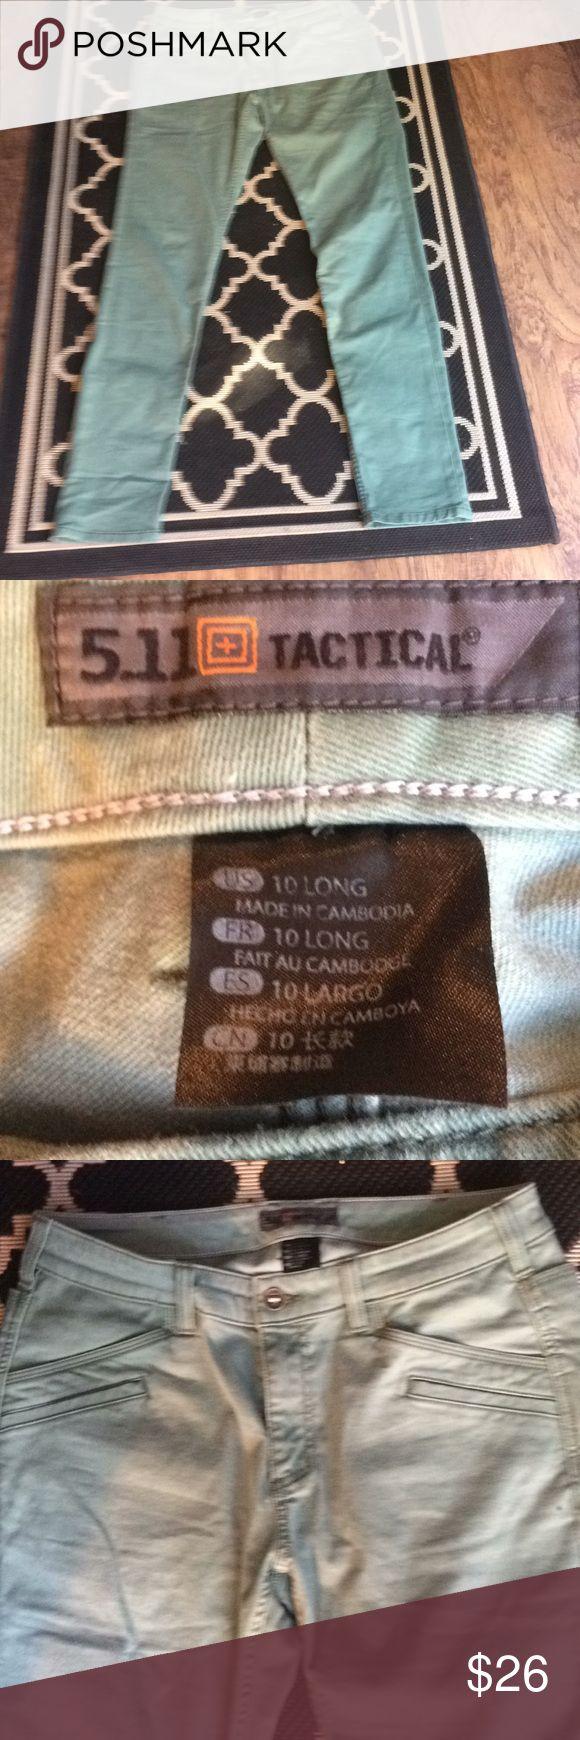 "EUC 511 Tactical👖Sz-10 Long Mint Green 6 pockets EUC 511 Tactical👖Sz-10 Long Mint Green 6 pockets no faults. Lying flat measured rise 9 1/2"" Waist 17"" Inseam 34"" approximately 511 Tactical Jeans Skinny"